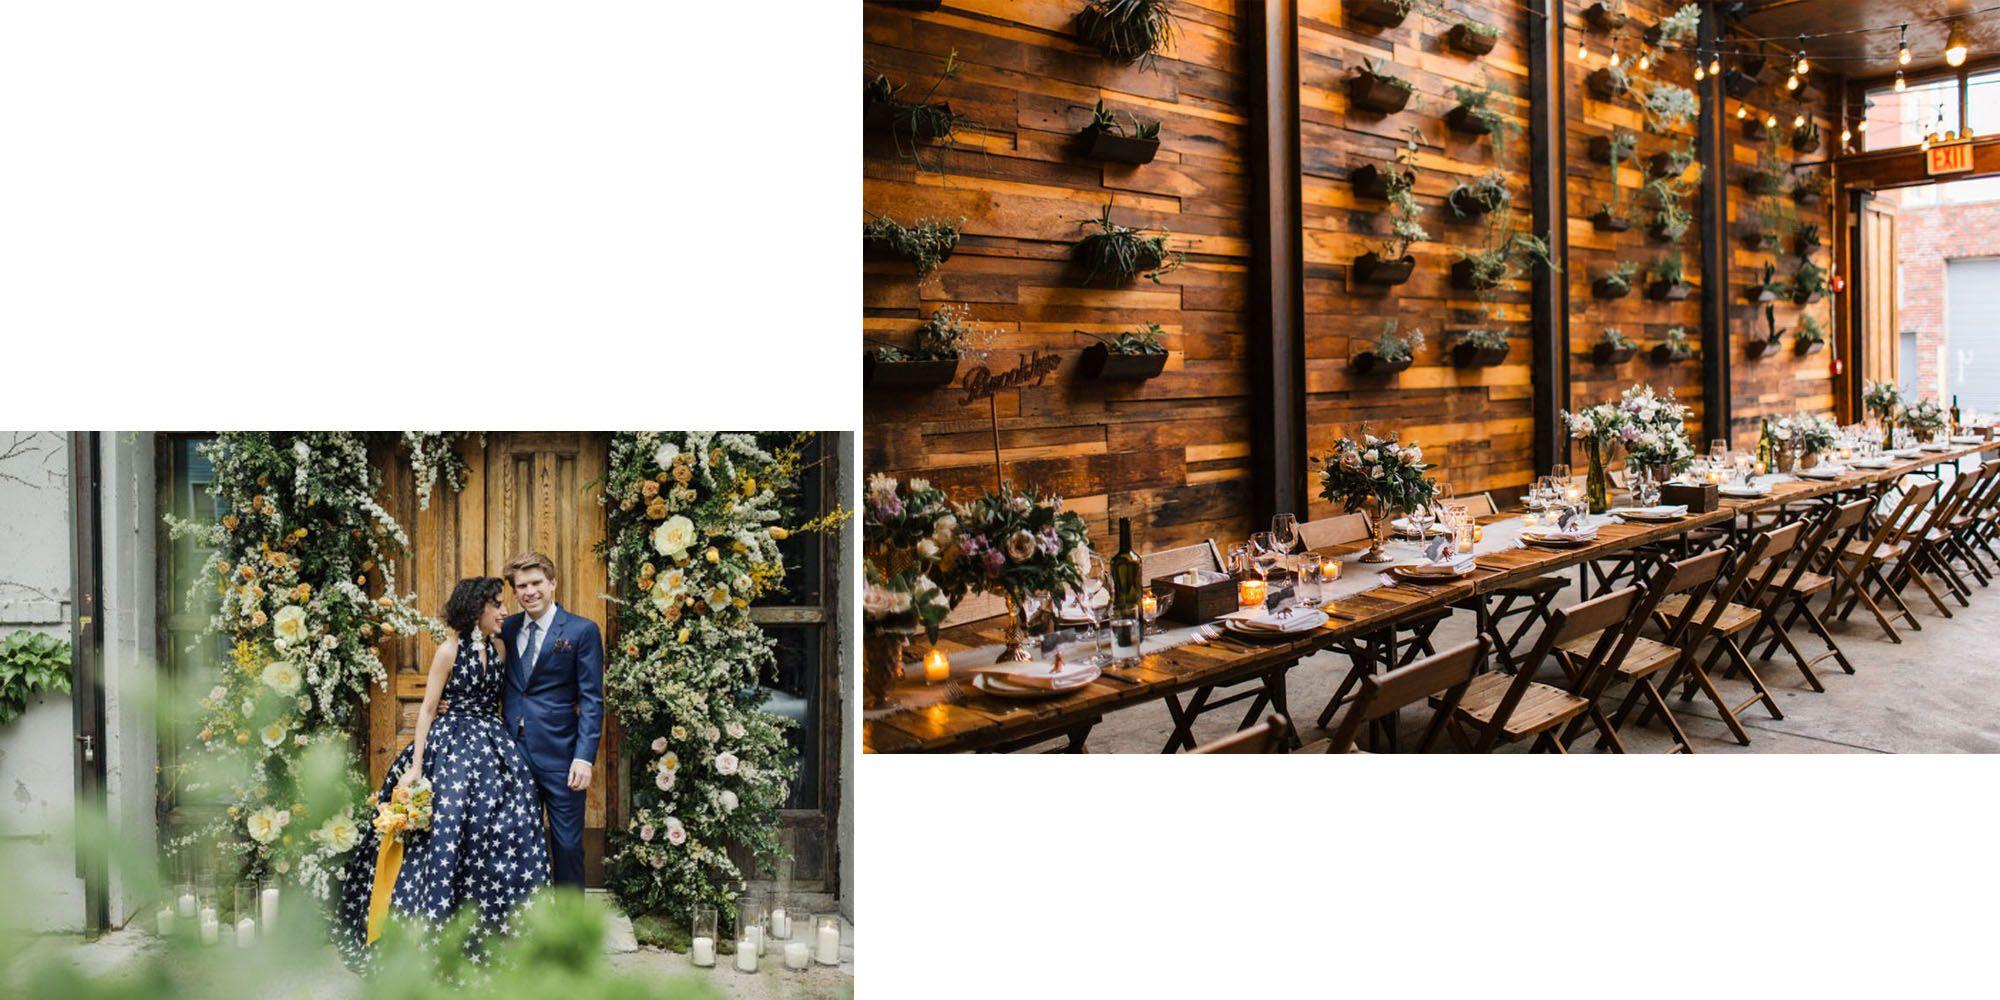 33 Best Outdoor Garden Wedding Venues - Where to Host a Garden ...